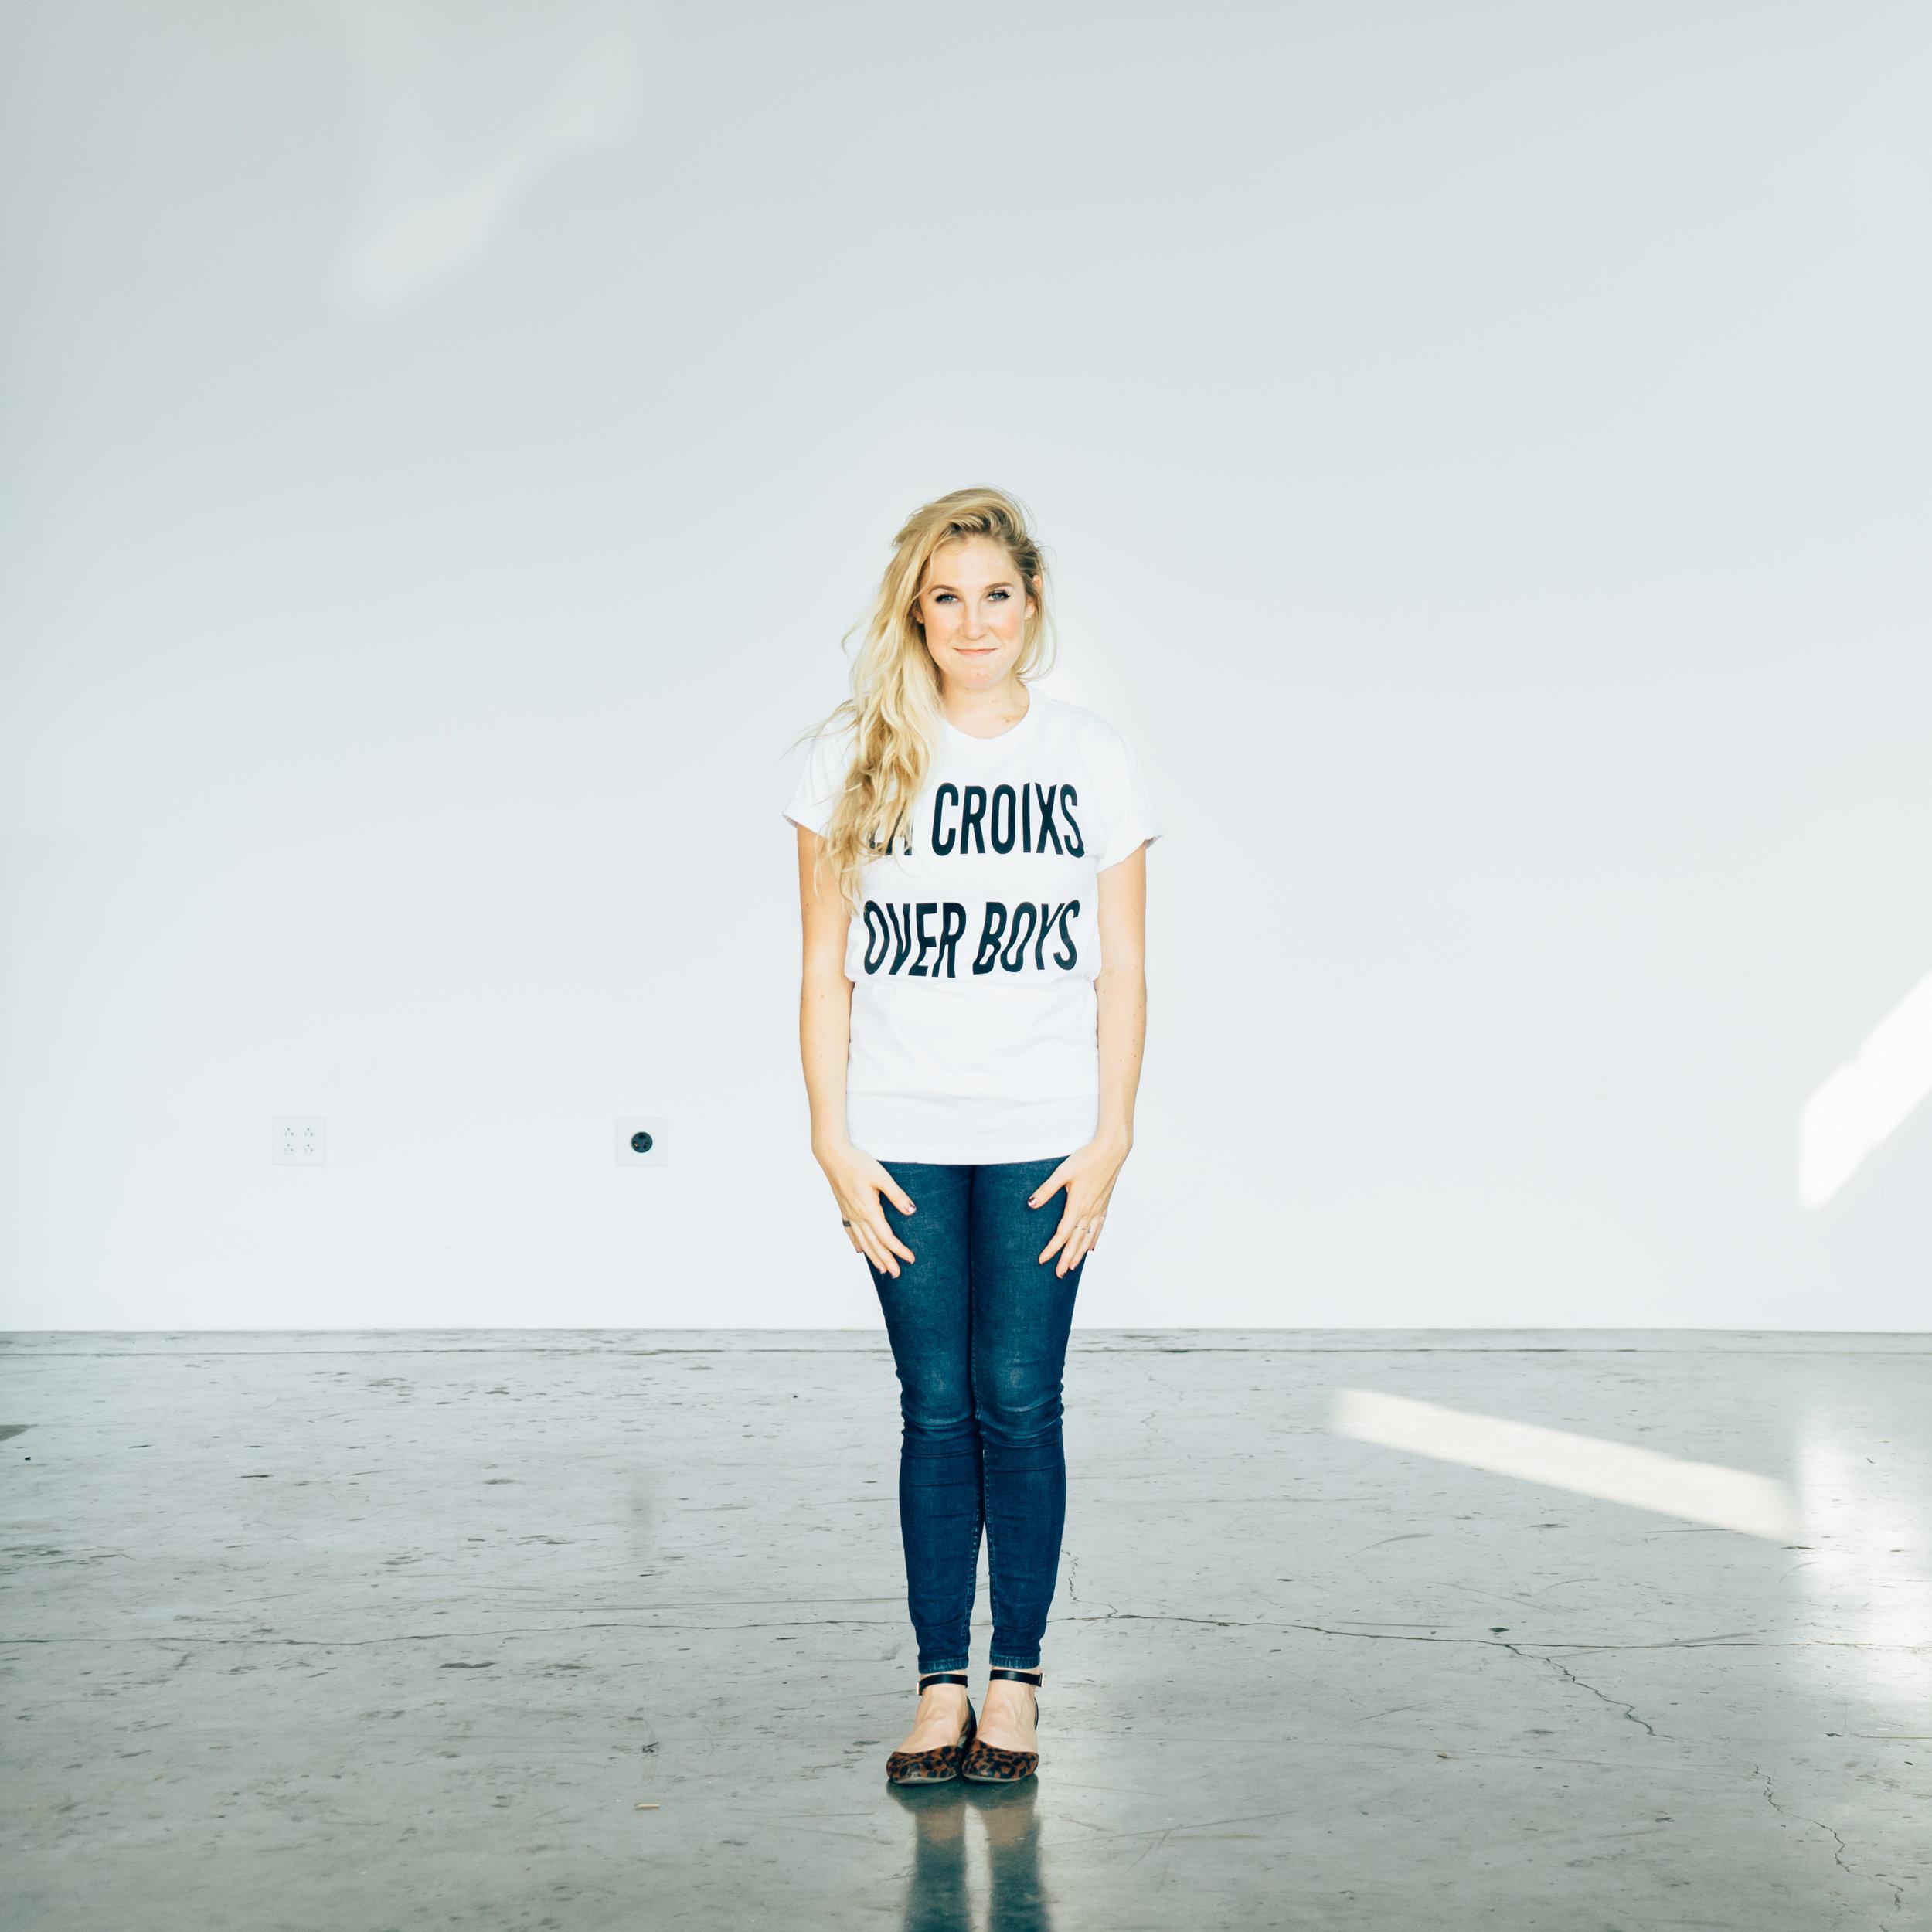 Chelsea Steele | LaCroixs Over Boys